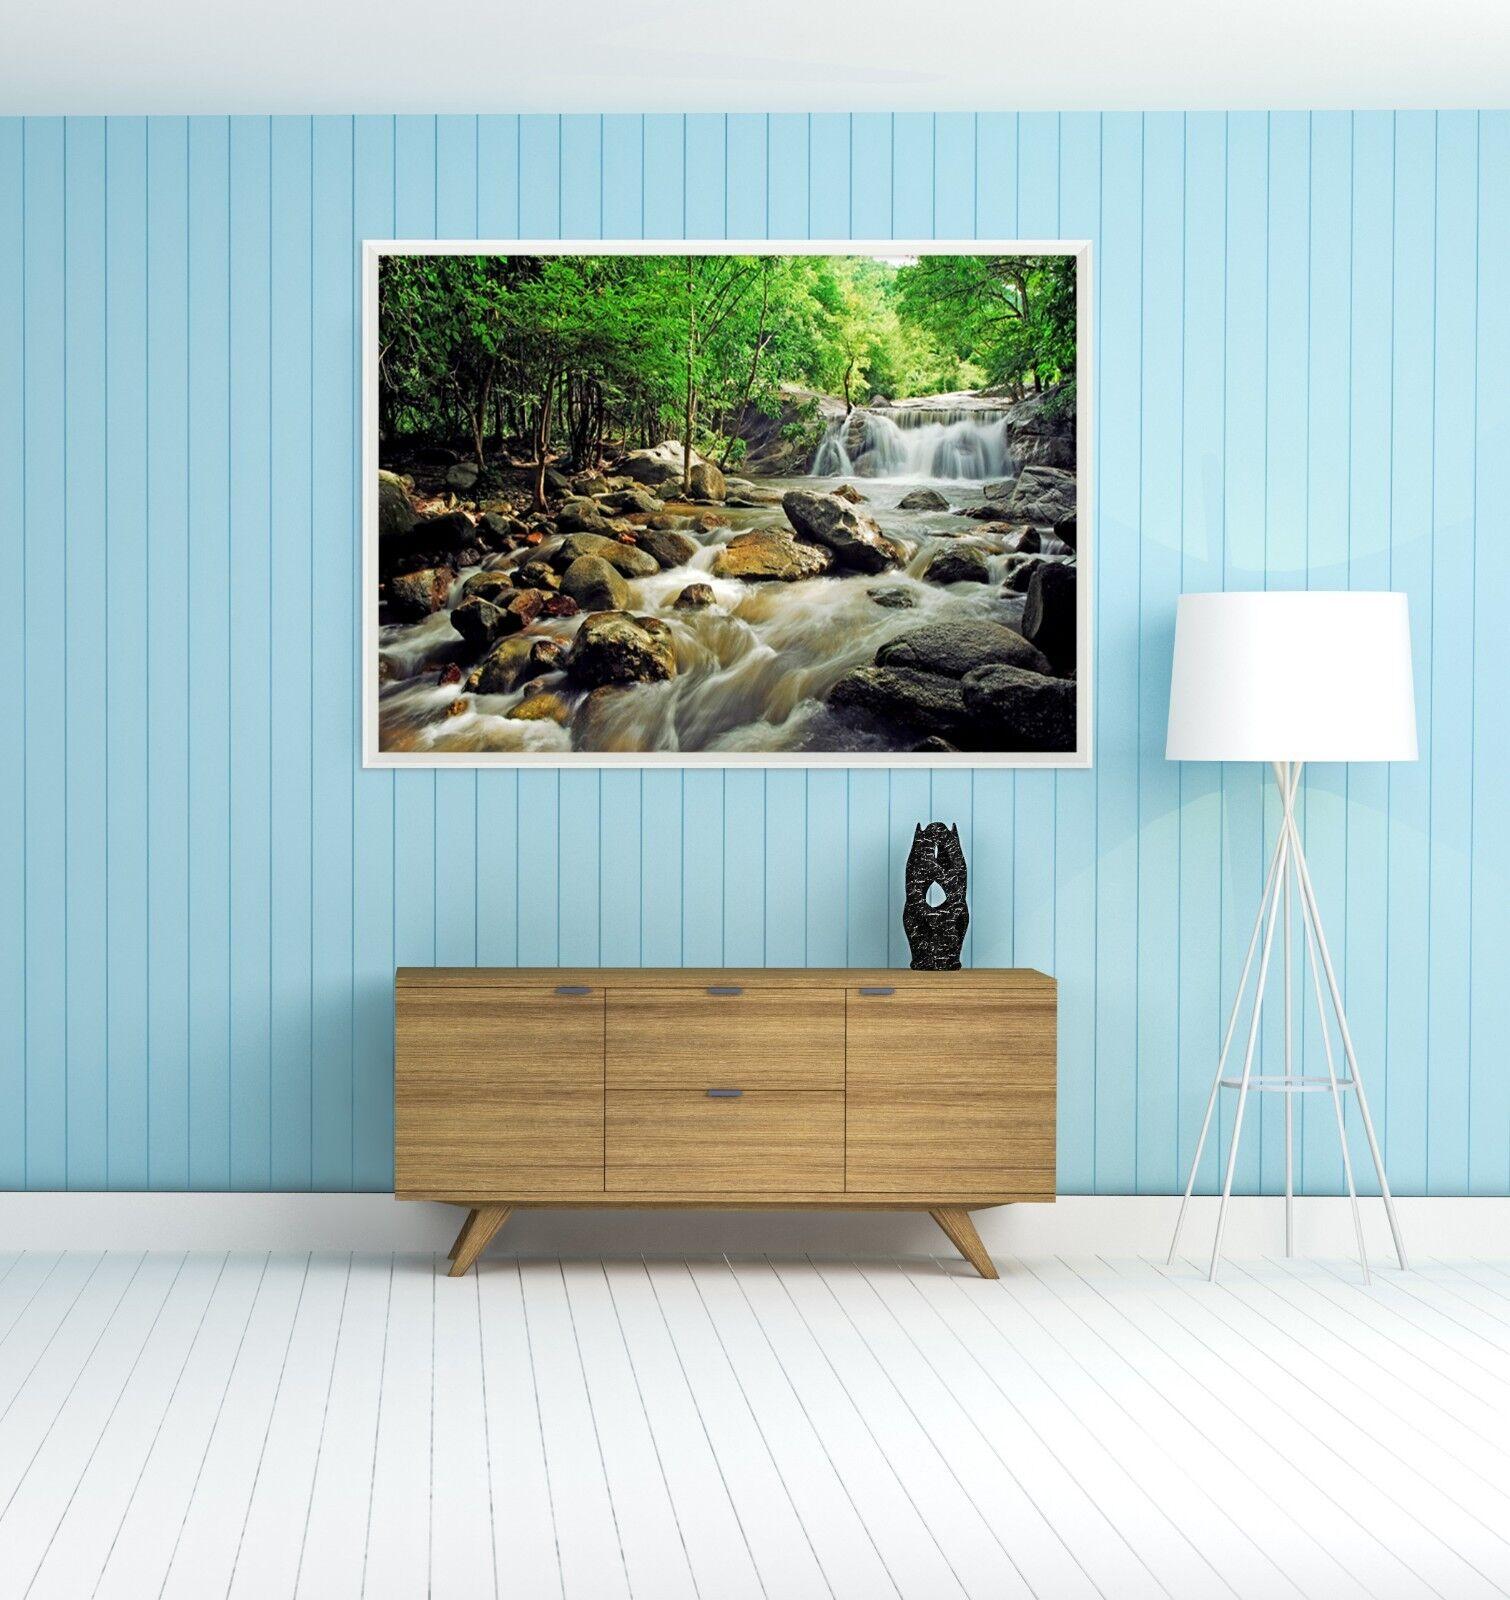 3D Stones Creek Forest  2 Framed Poster Home Decor Print Painting Art WALLPAPER